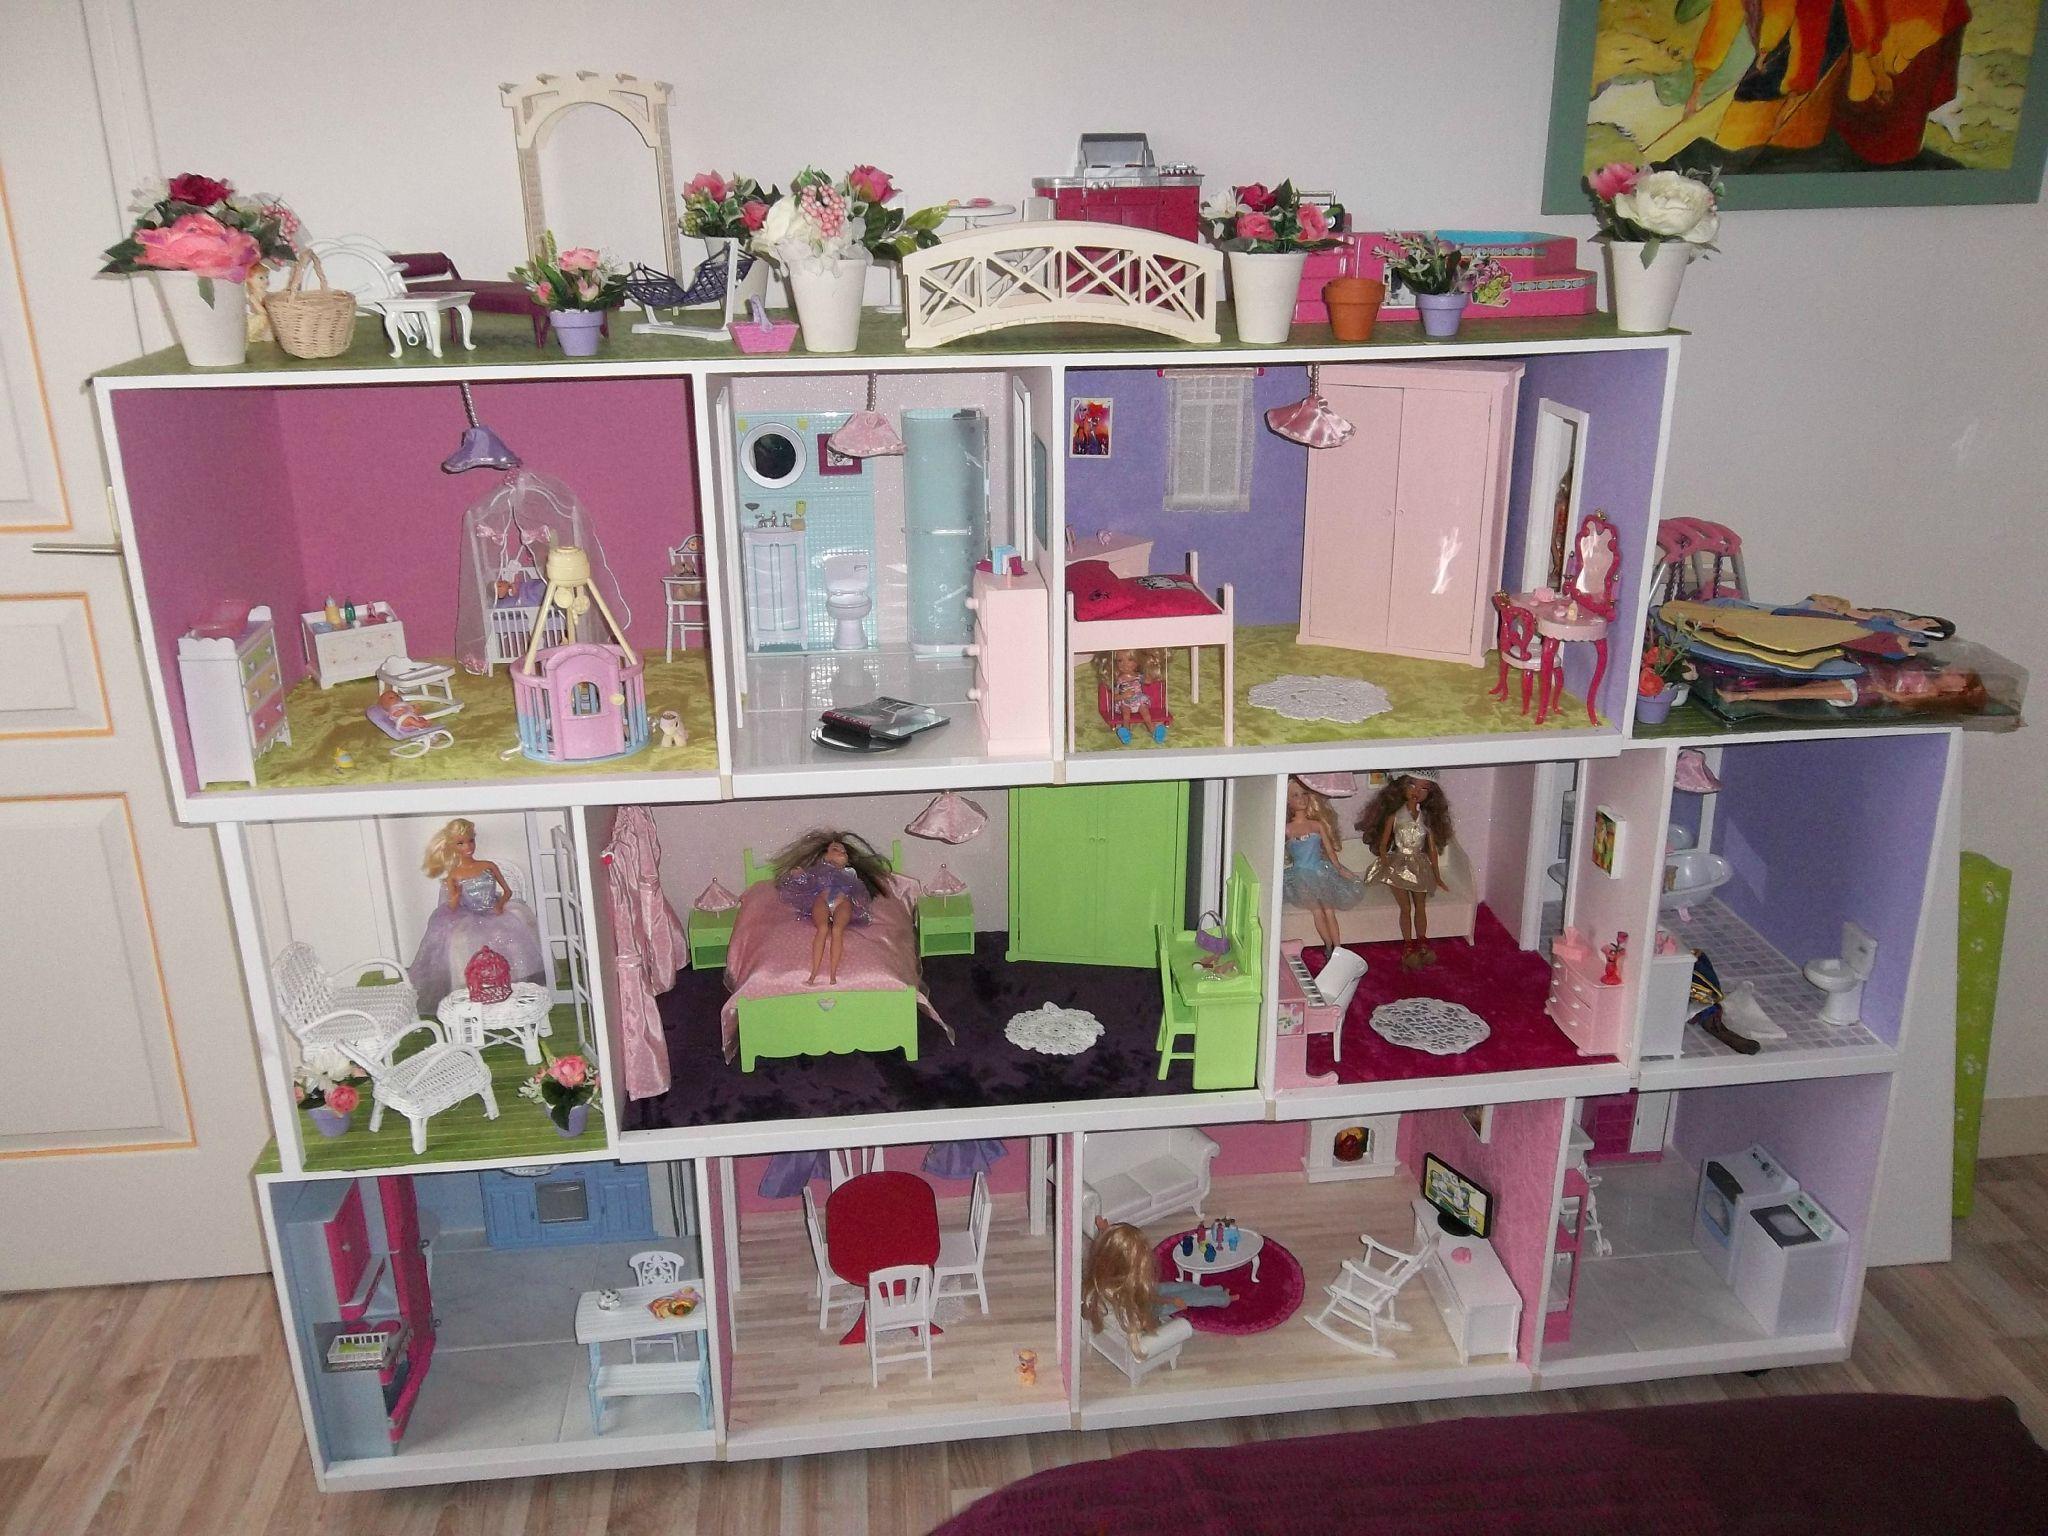 fabrication maisons de poup e barbie construction de maisons de poup e barbie maison barbie. Black Bedroom Furniture Sets. Home Design Ideas